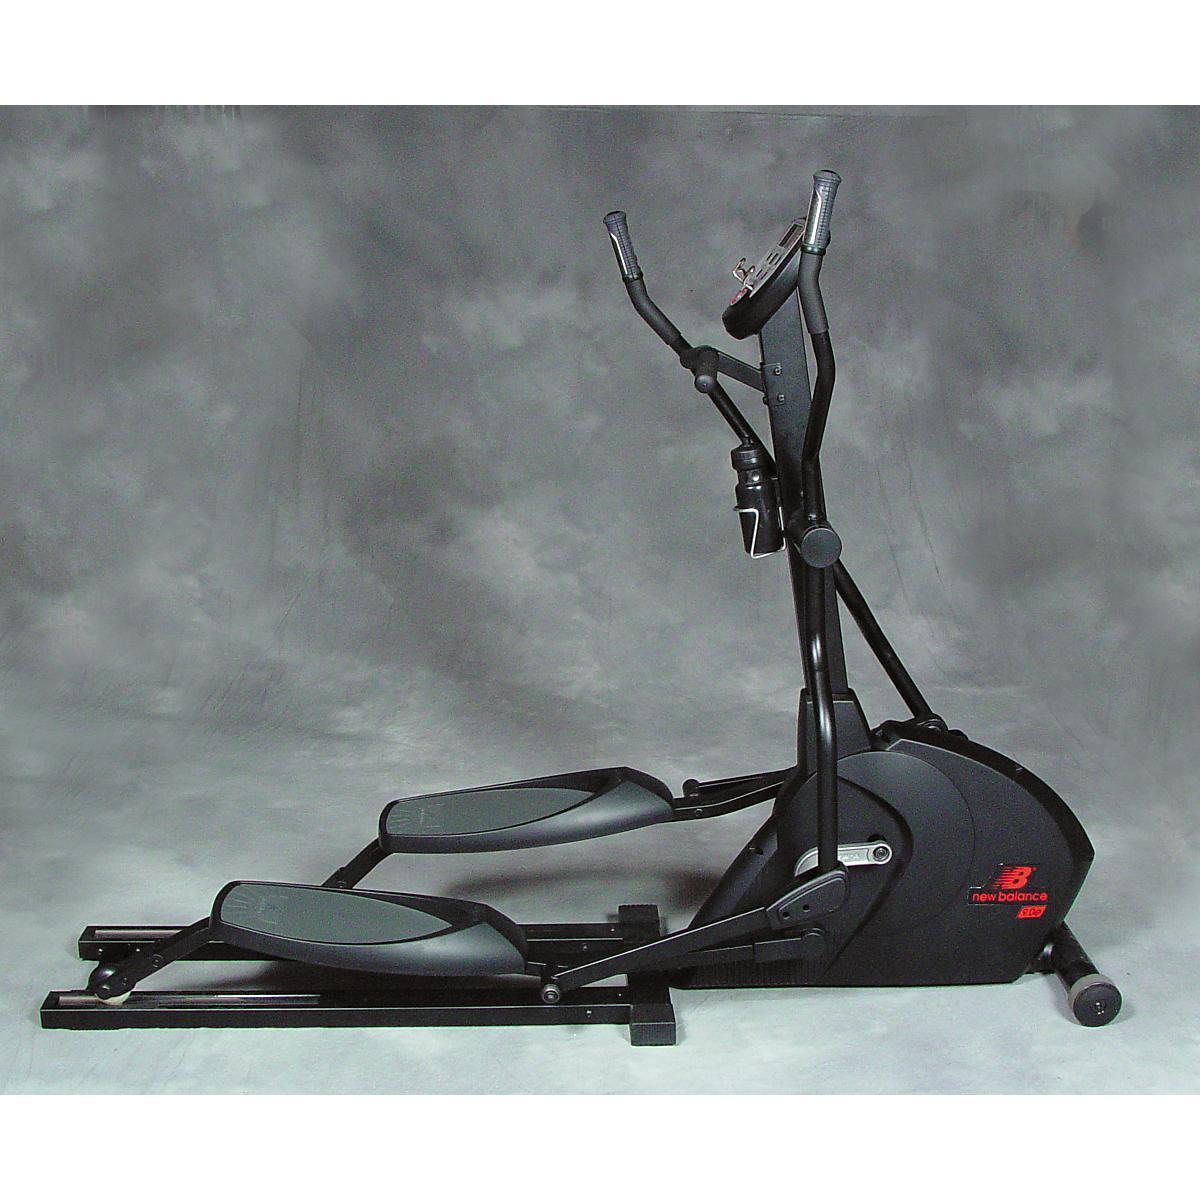 New Balance 9.0e Elliptical Trainer Fitness Equipment At